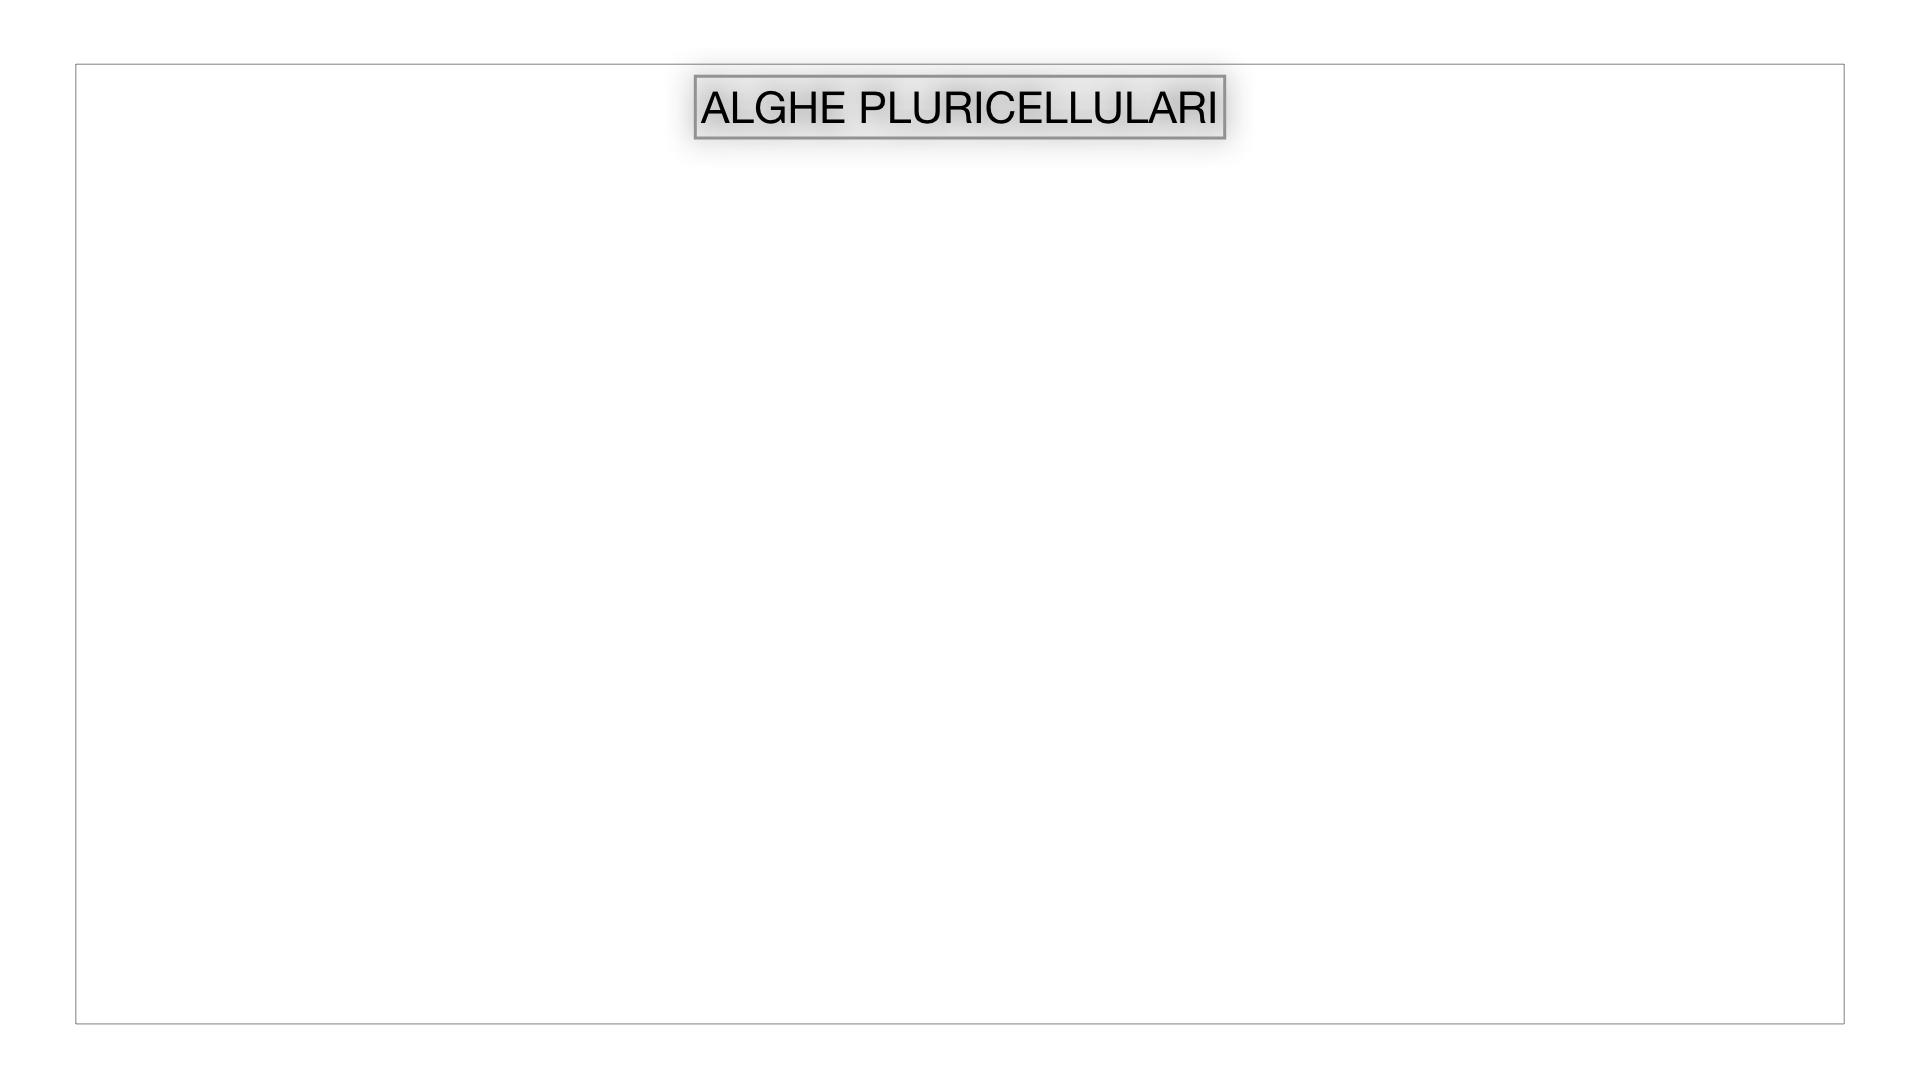 8. alghe uni_pluri_cellulari_SIMULAZIONE.030